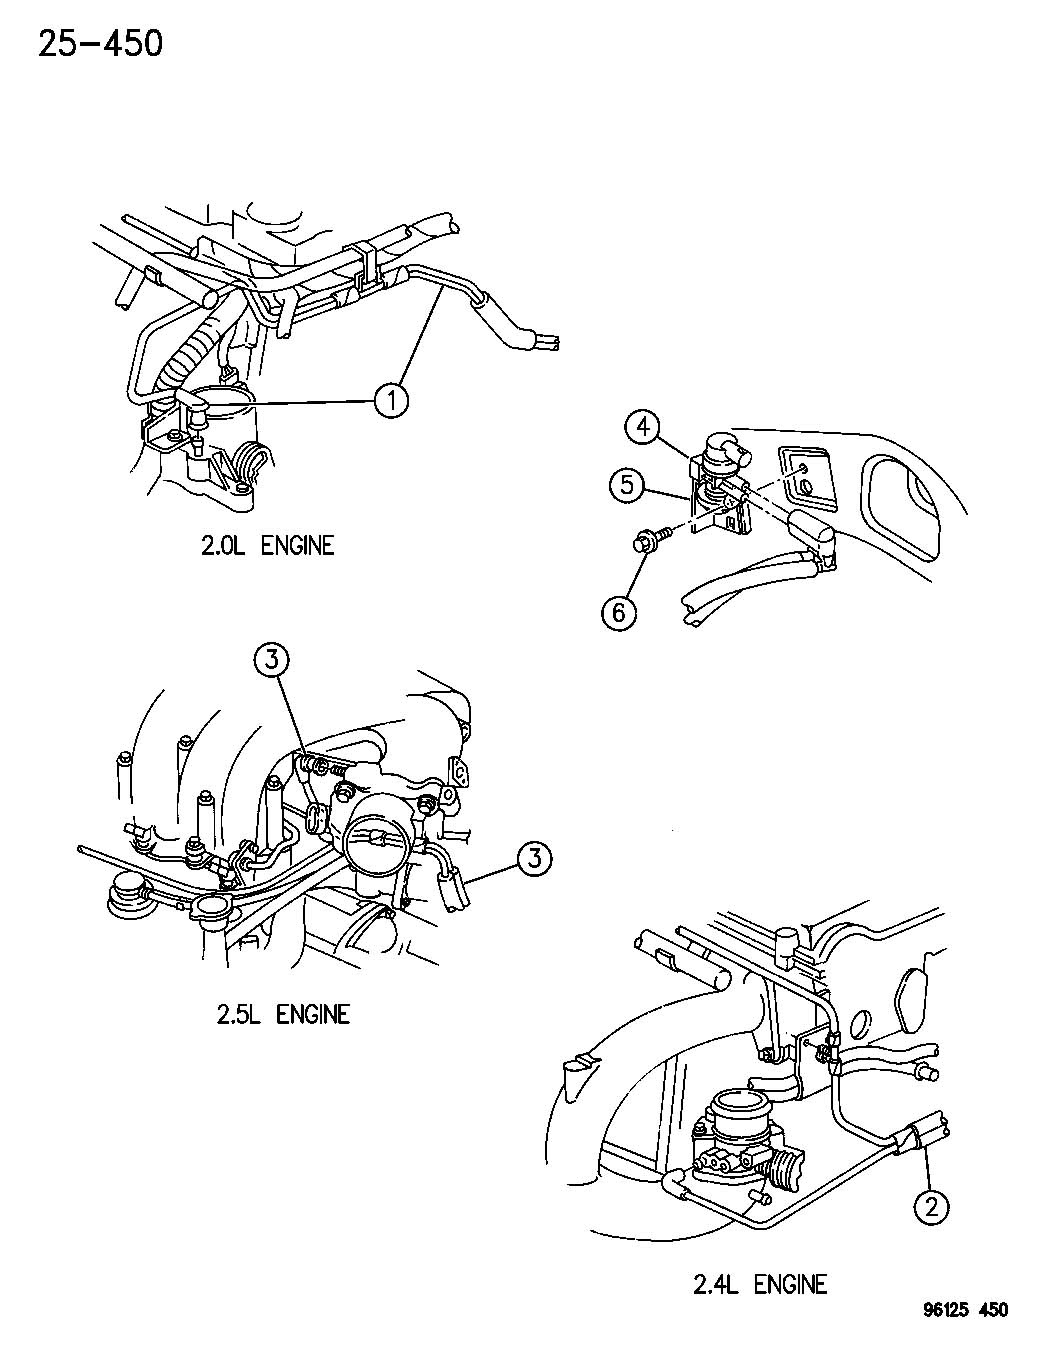 Chrysler Sebring Harness Vapor Purge Edz 2 4l Engine